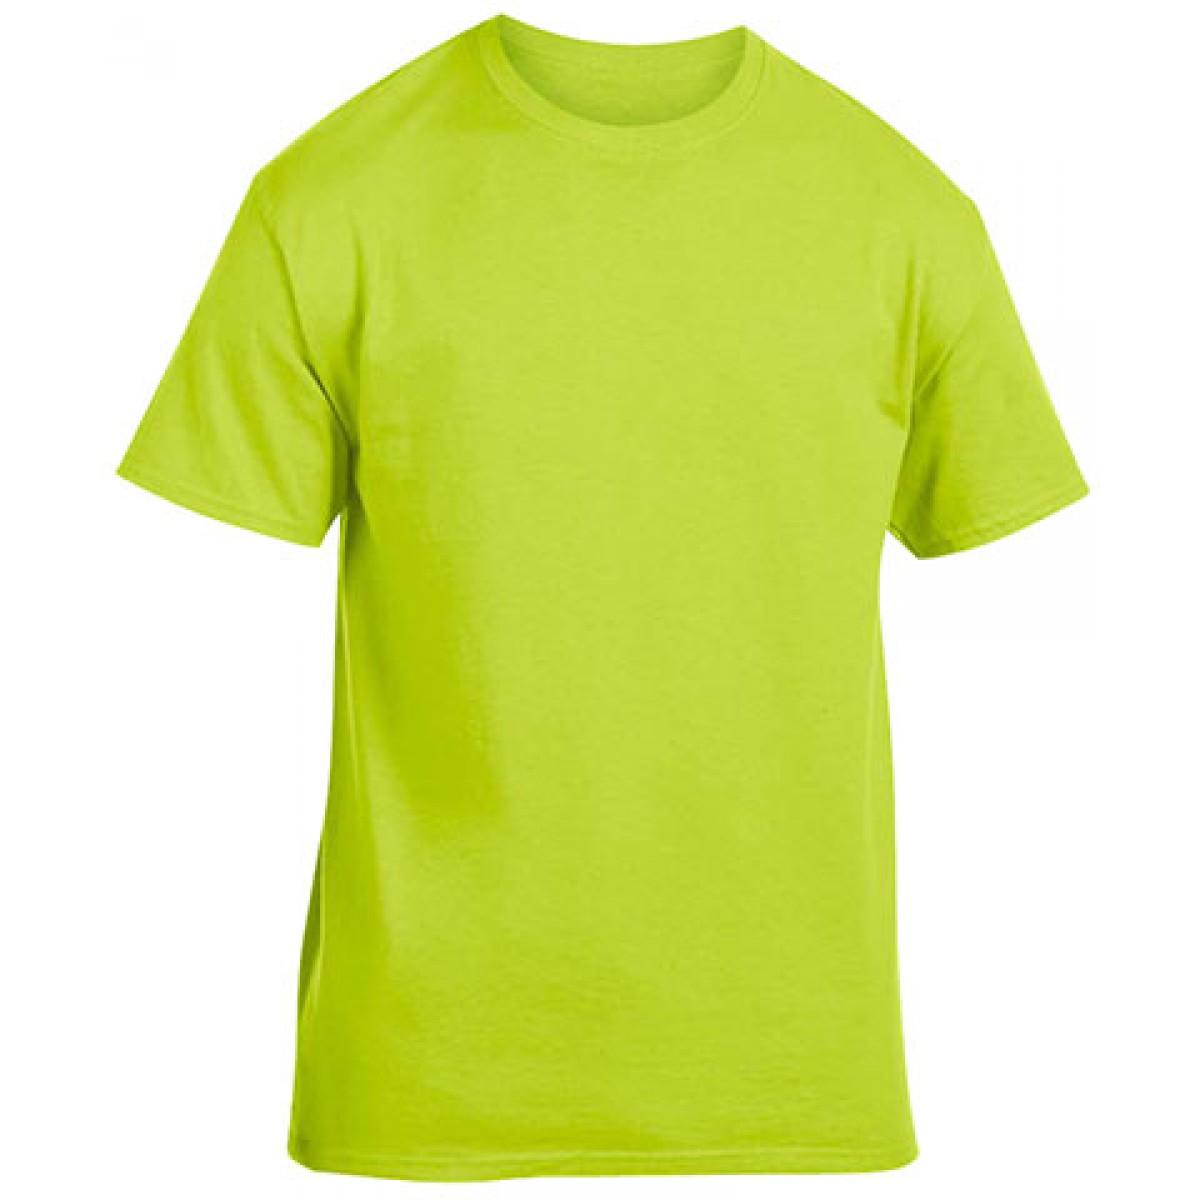 Cotton Short Sleeve T-Shirt-Safety Green-S